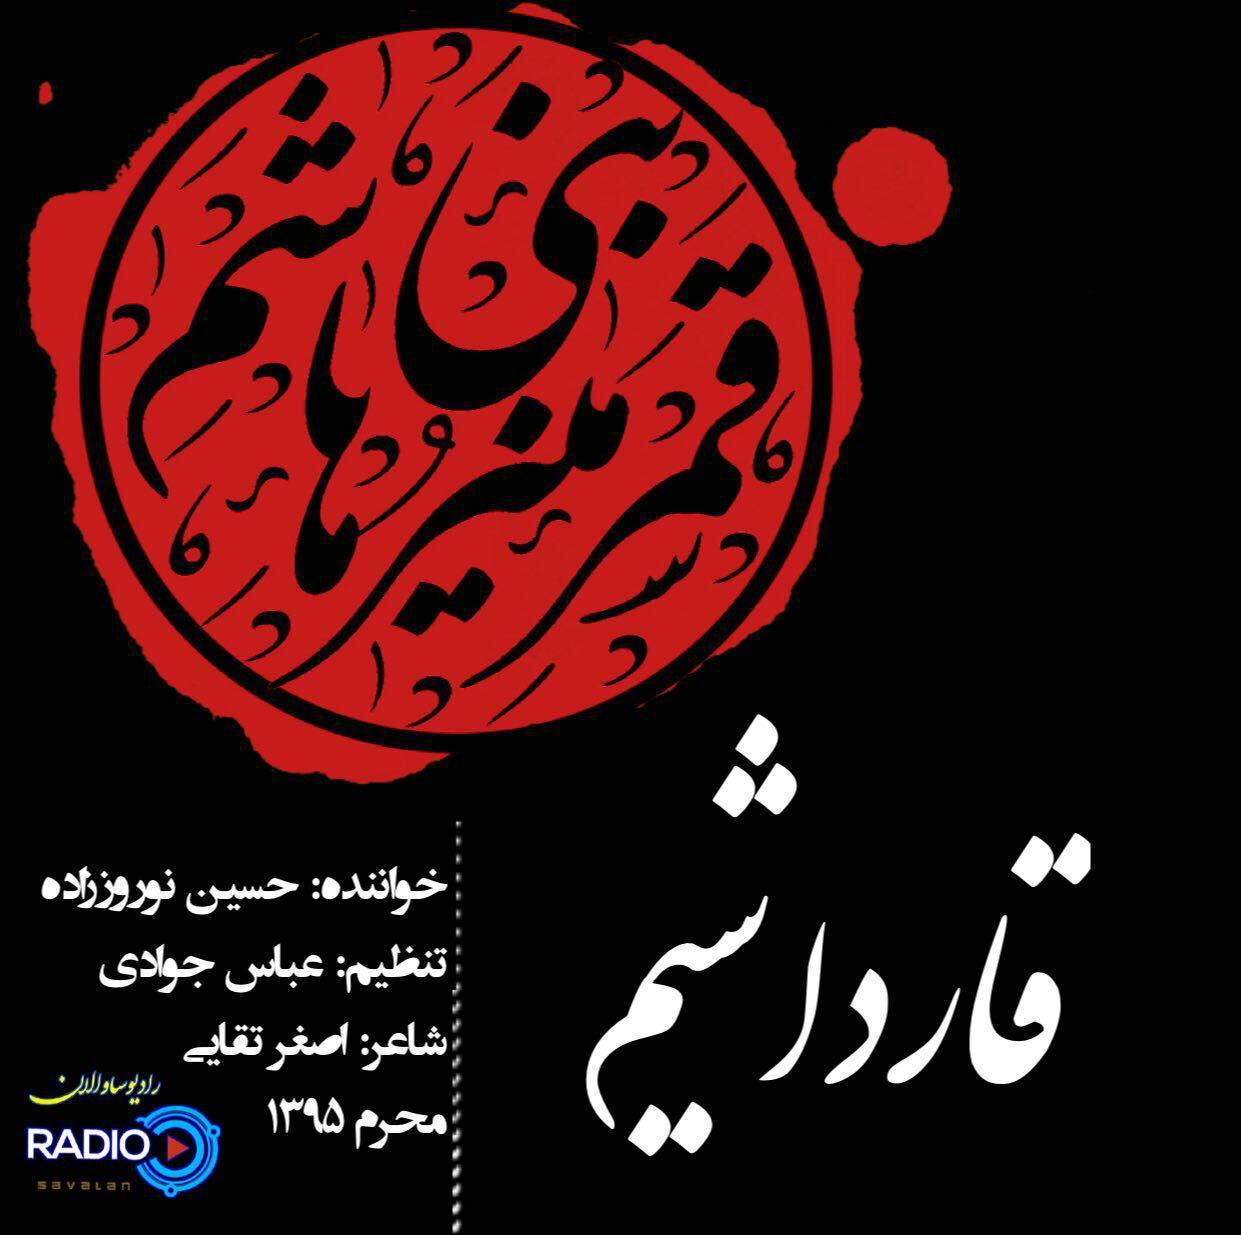 http://s8.picofile.com/file/8307261976/04Hosein_Norouz_Zadeh_Ghardashim.jpg